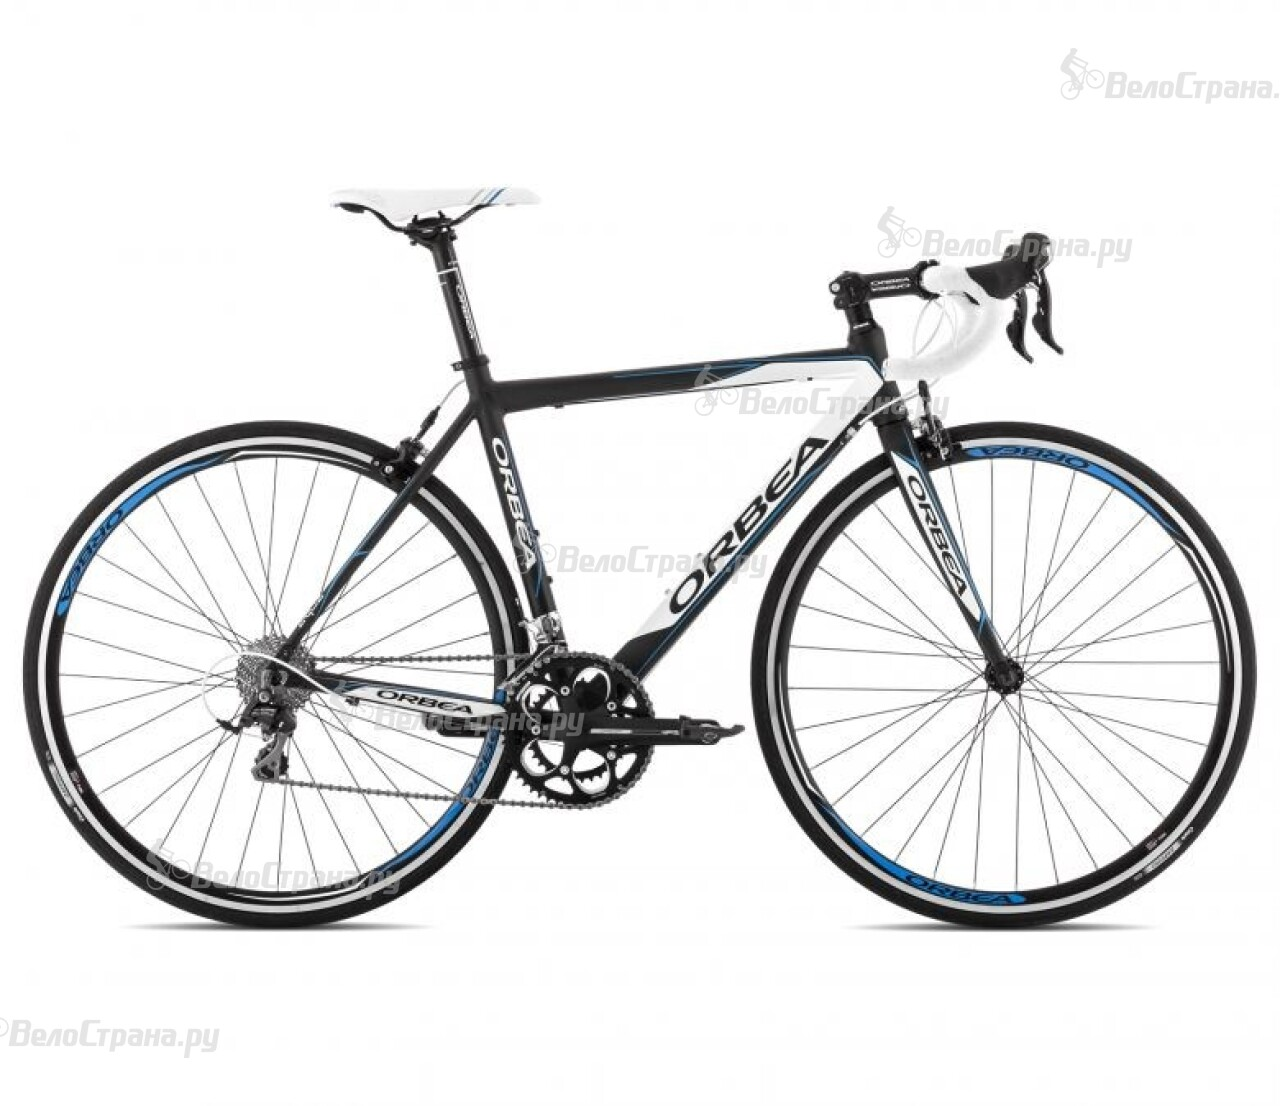 Велосипед Orbea Aqua 10 (2014) велосипед orbea aqua t23 2013